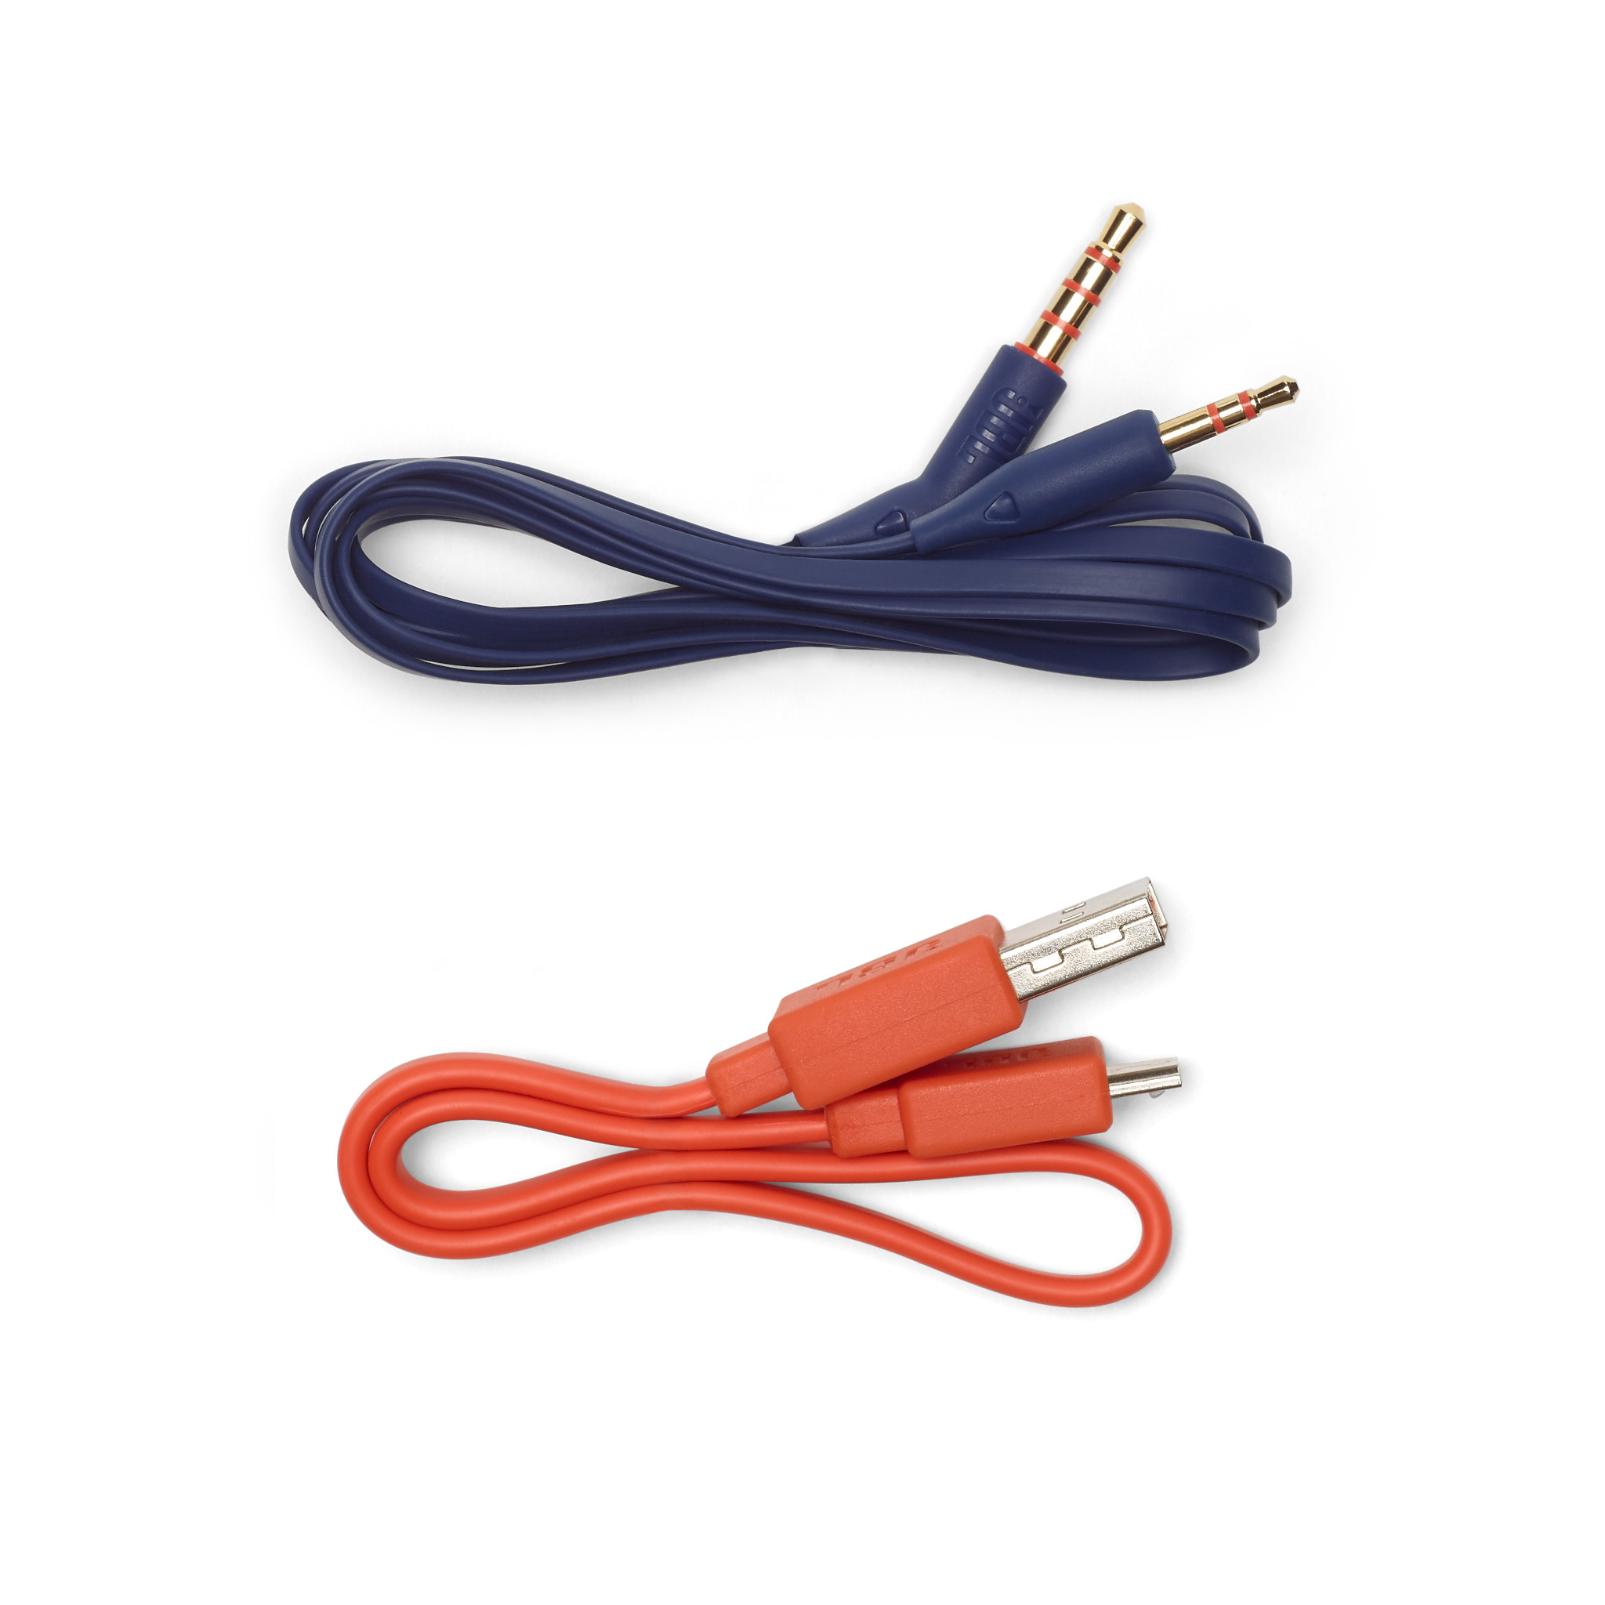 JBL TUNE 750BTNC - Blue - Wireless Over-Ear ANC Headphones - Detailshot 5